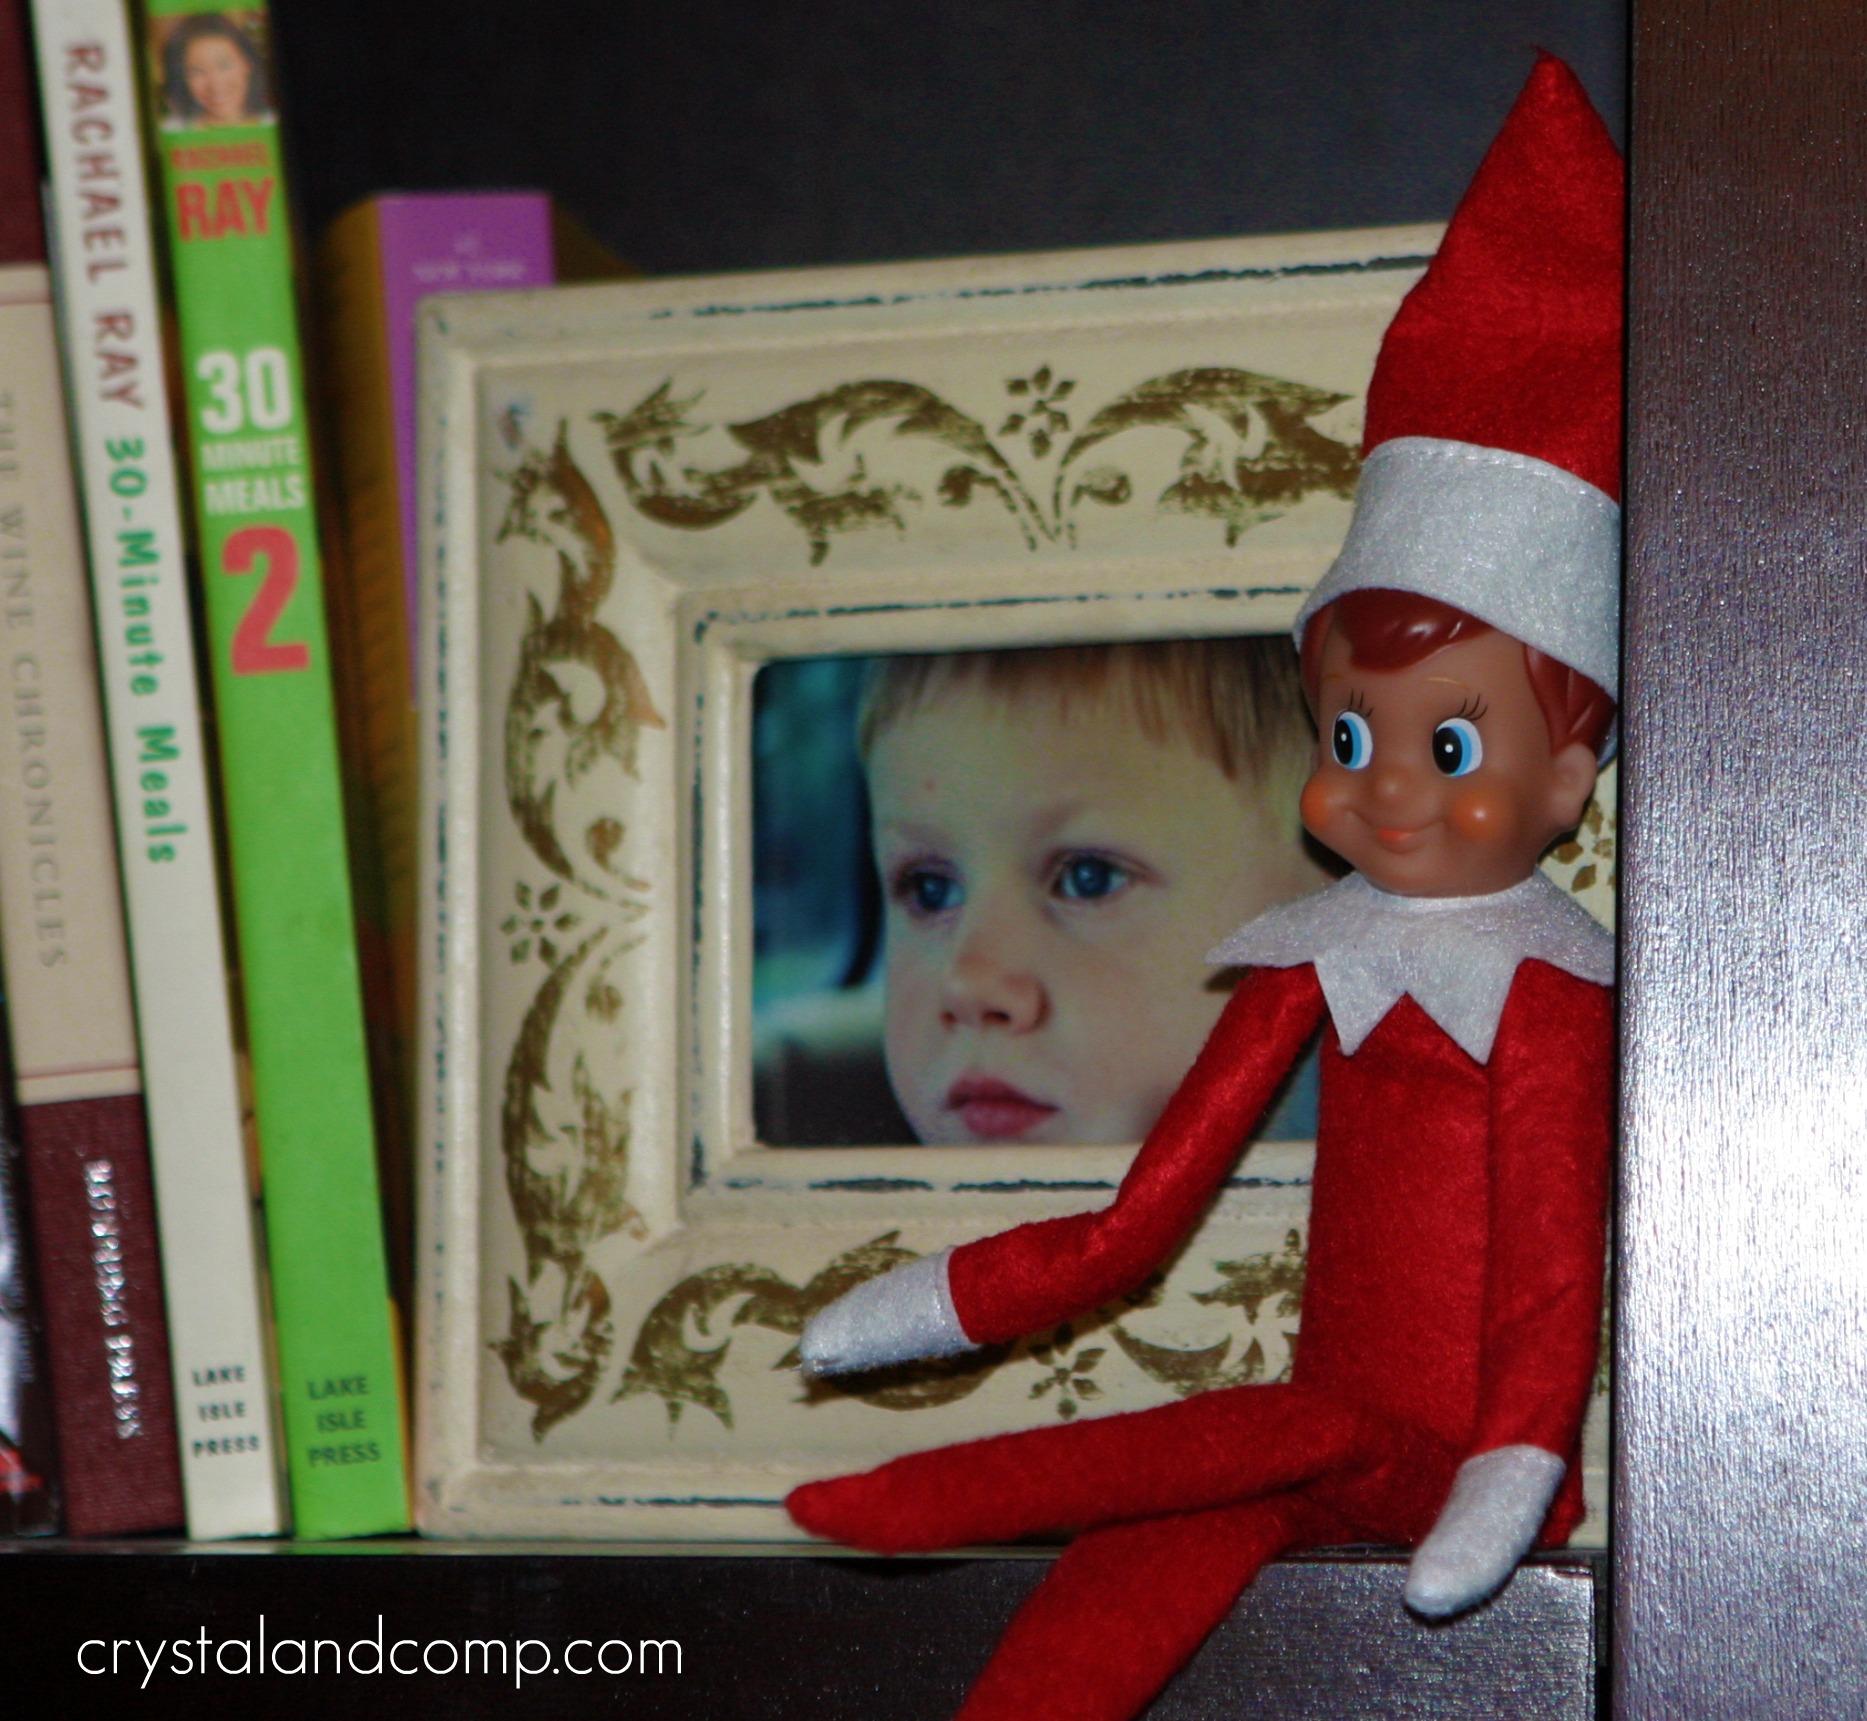 the elf on the shelf stole christmas